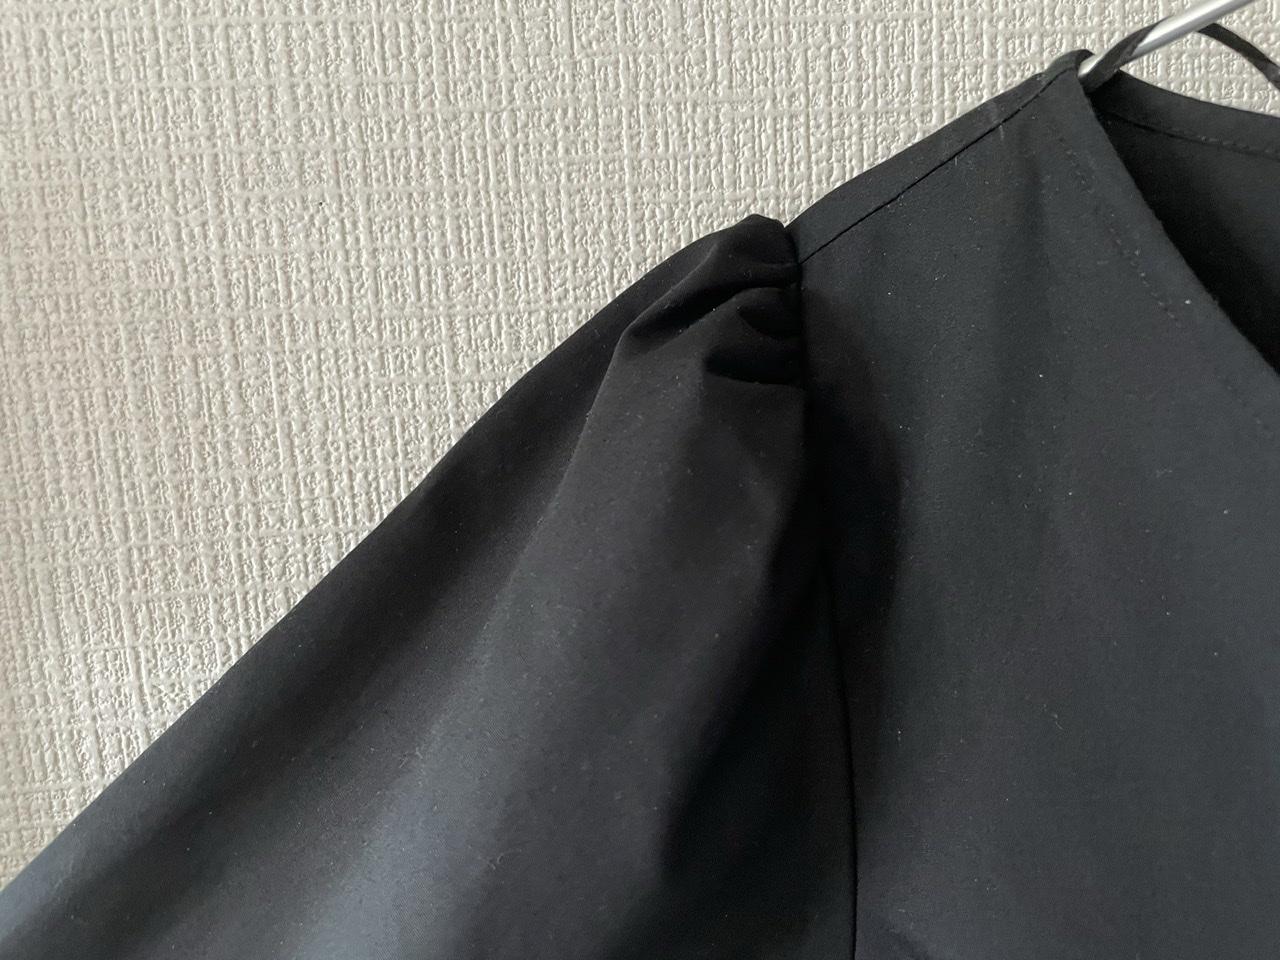 【GU】黒のティアードワンピで大人っぽ春コーデ_2